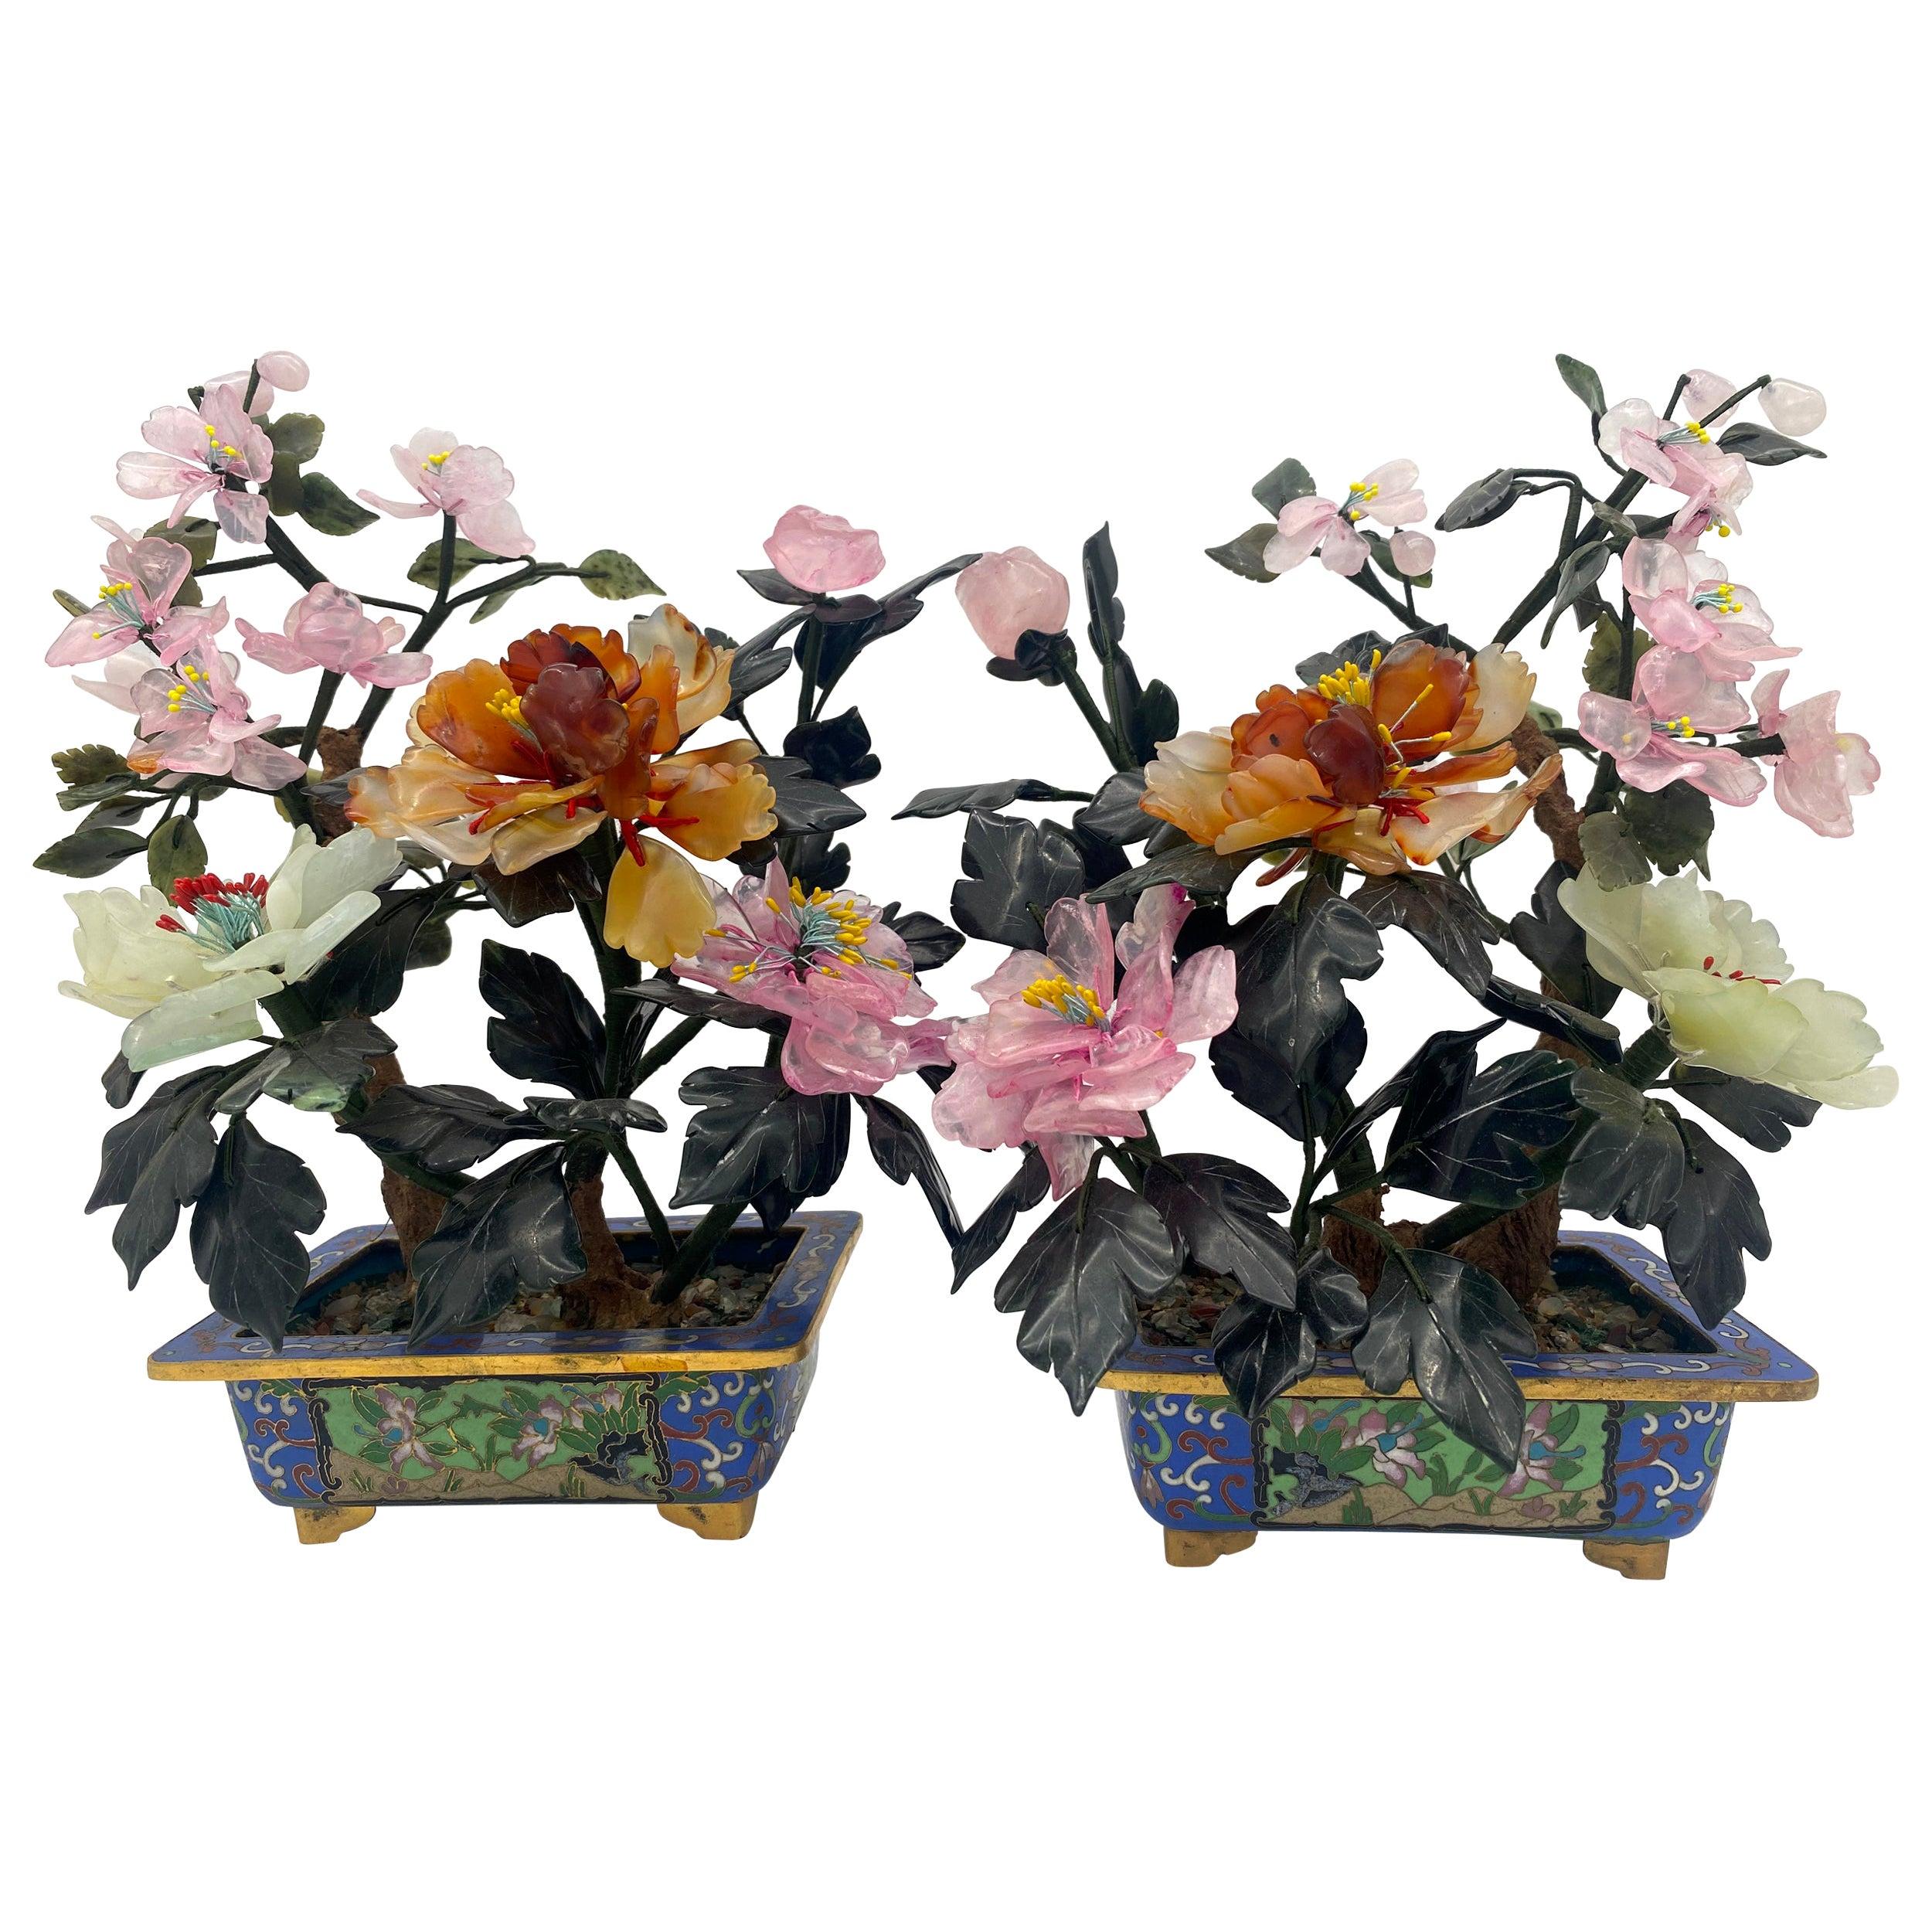 Chinese Multi-Color Bonsai Tree in Cloisonné Pot